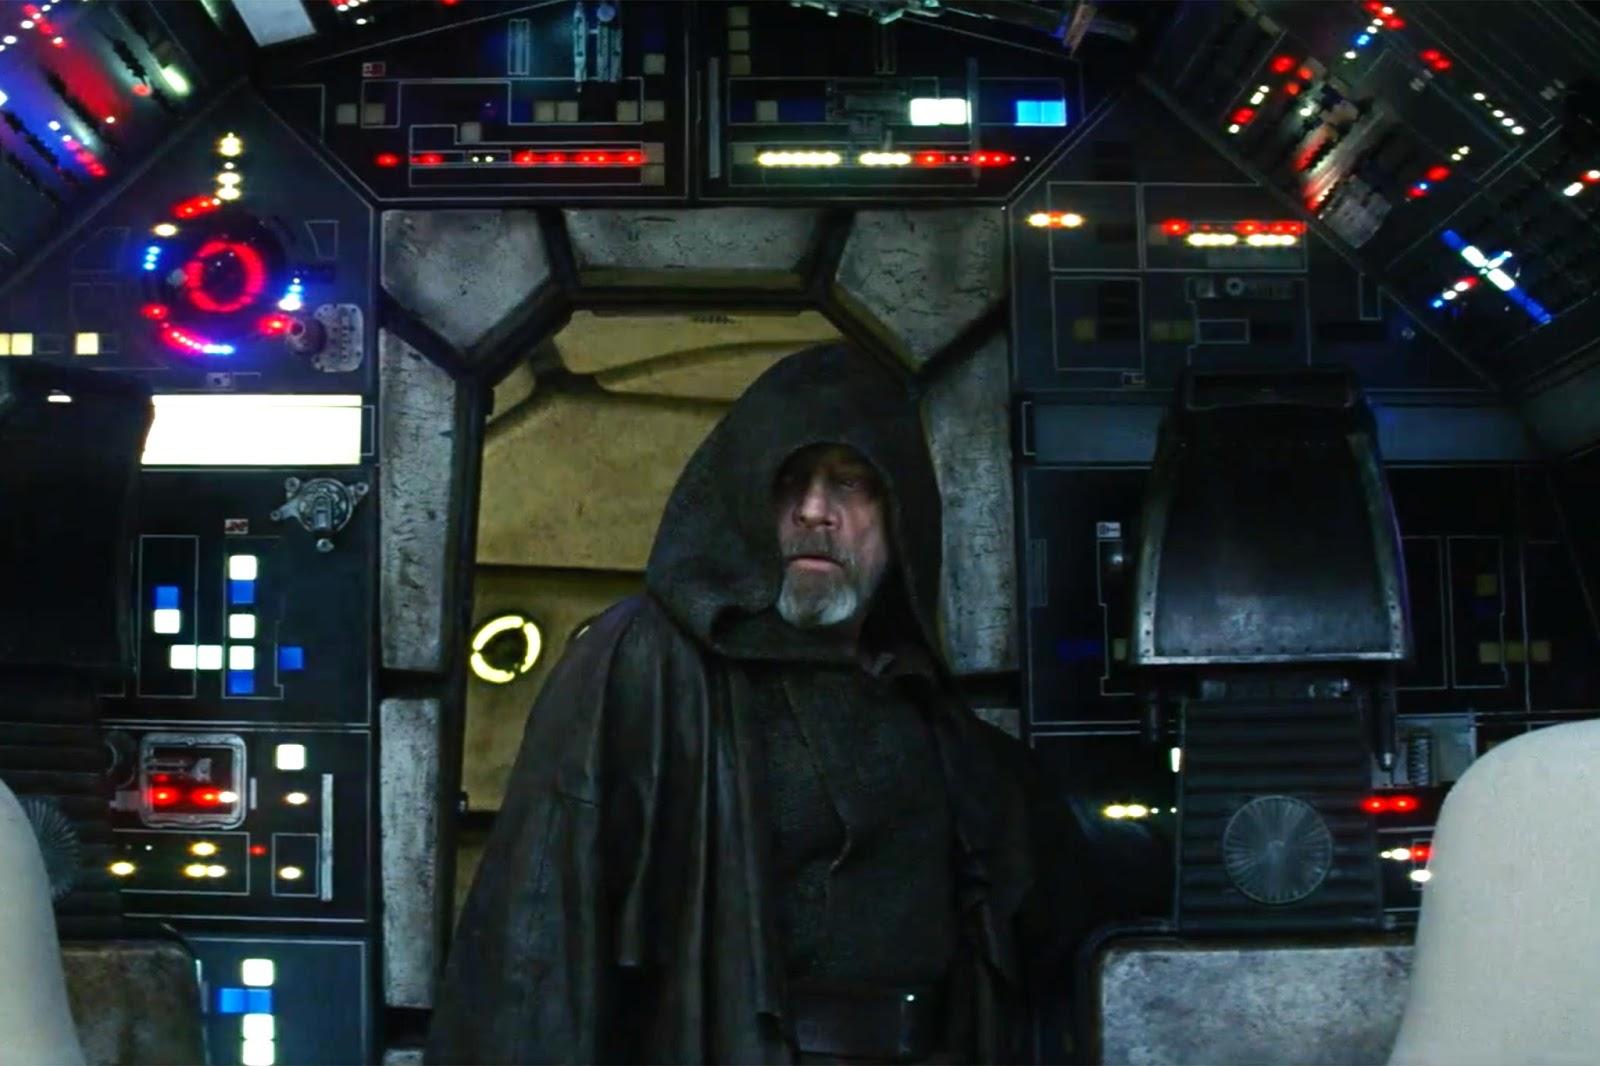 Luke Skywalker in the cockpit of the Millennium Falcon